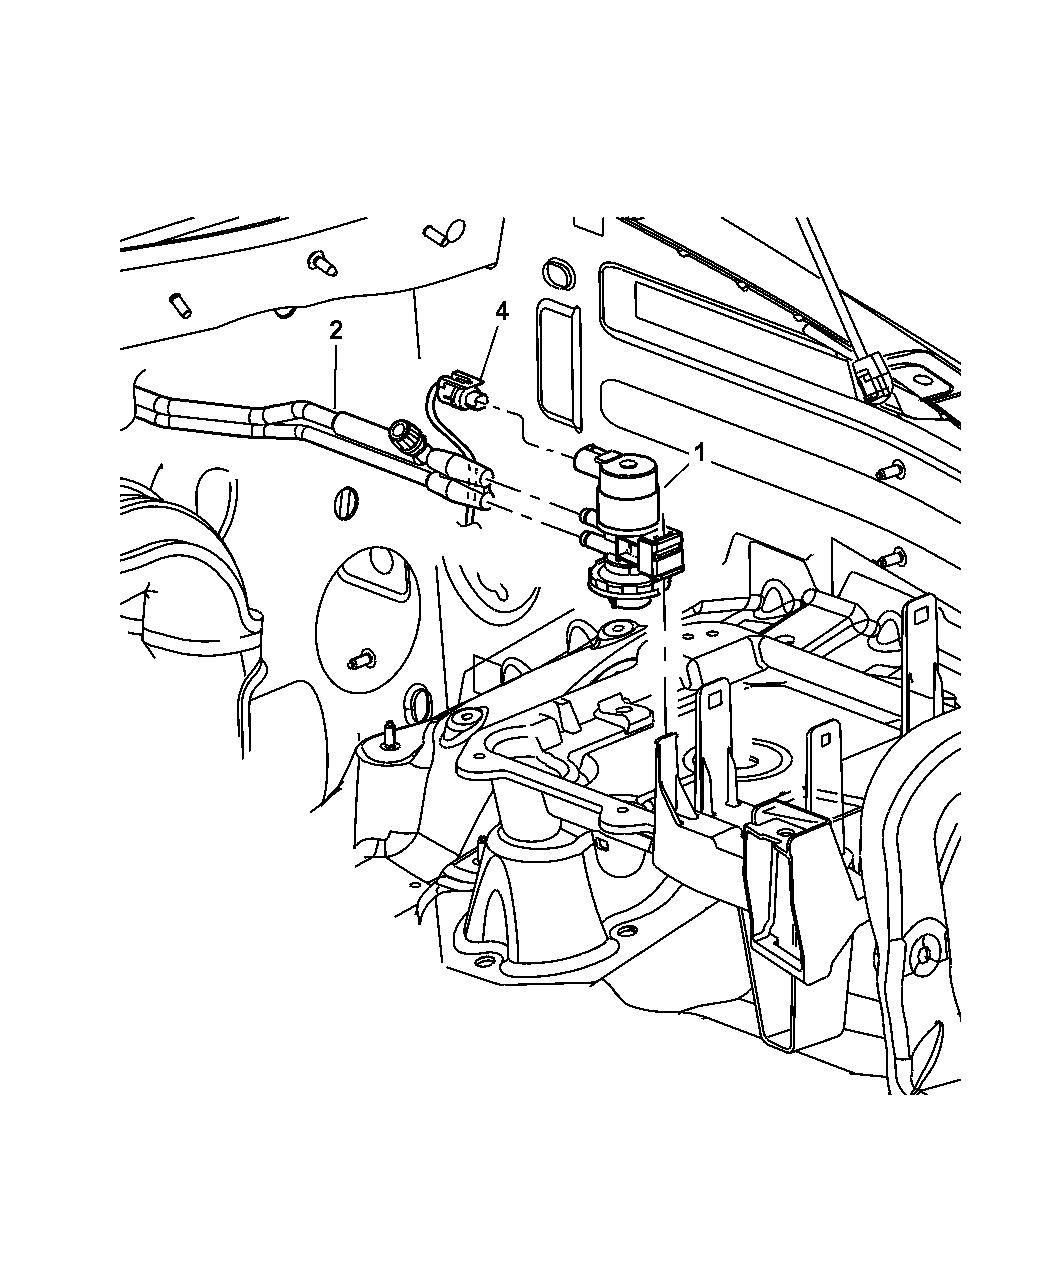 Jeep Liberty Emission Vacuum Harness